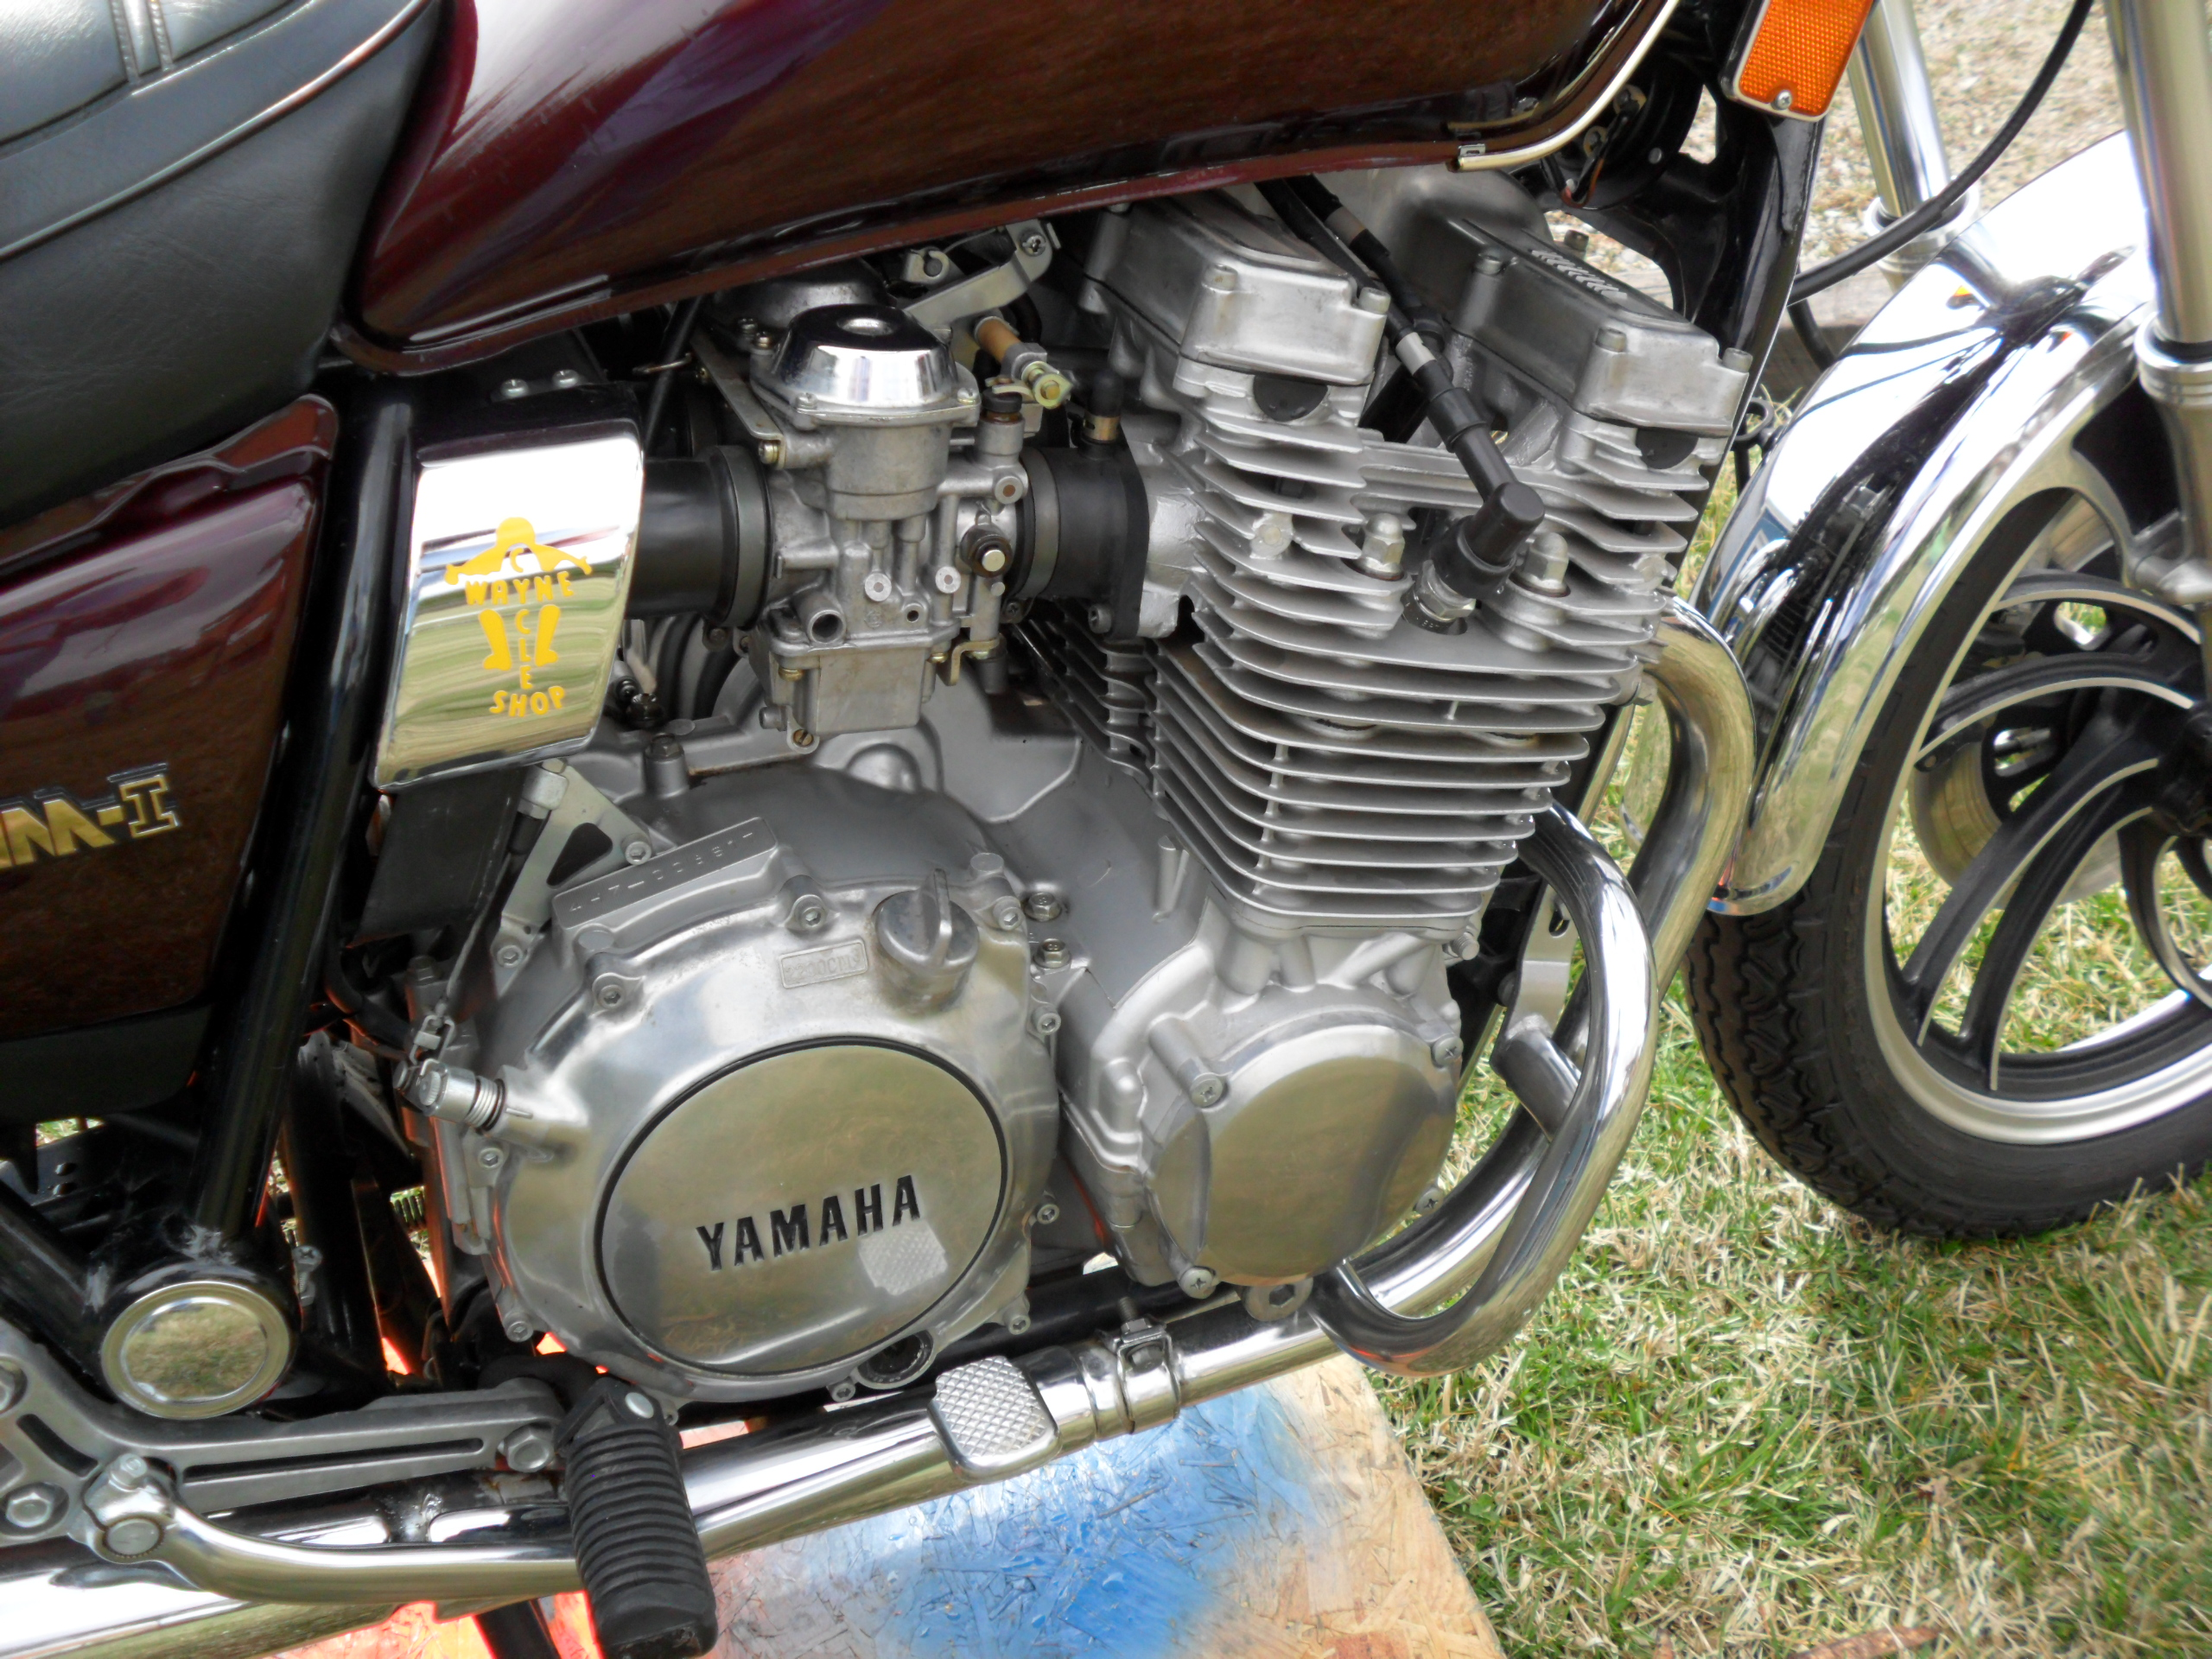 110 Mini Chopper Wiring Diagram 1981 Yamaha Xj 400 Seca Moto Zombdrive Com